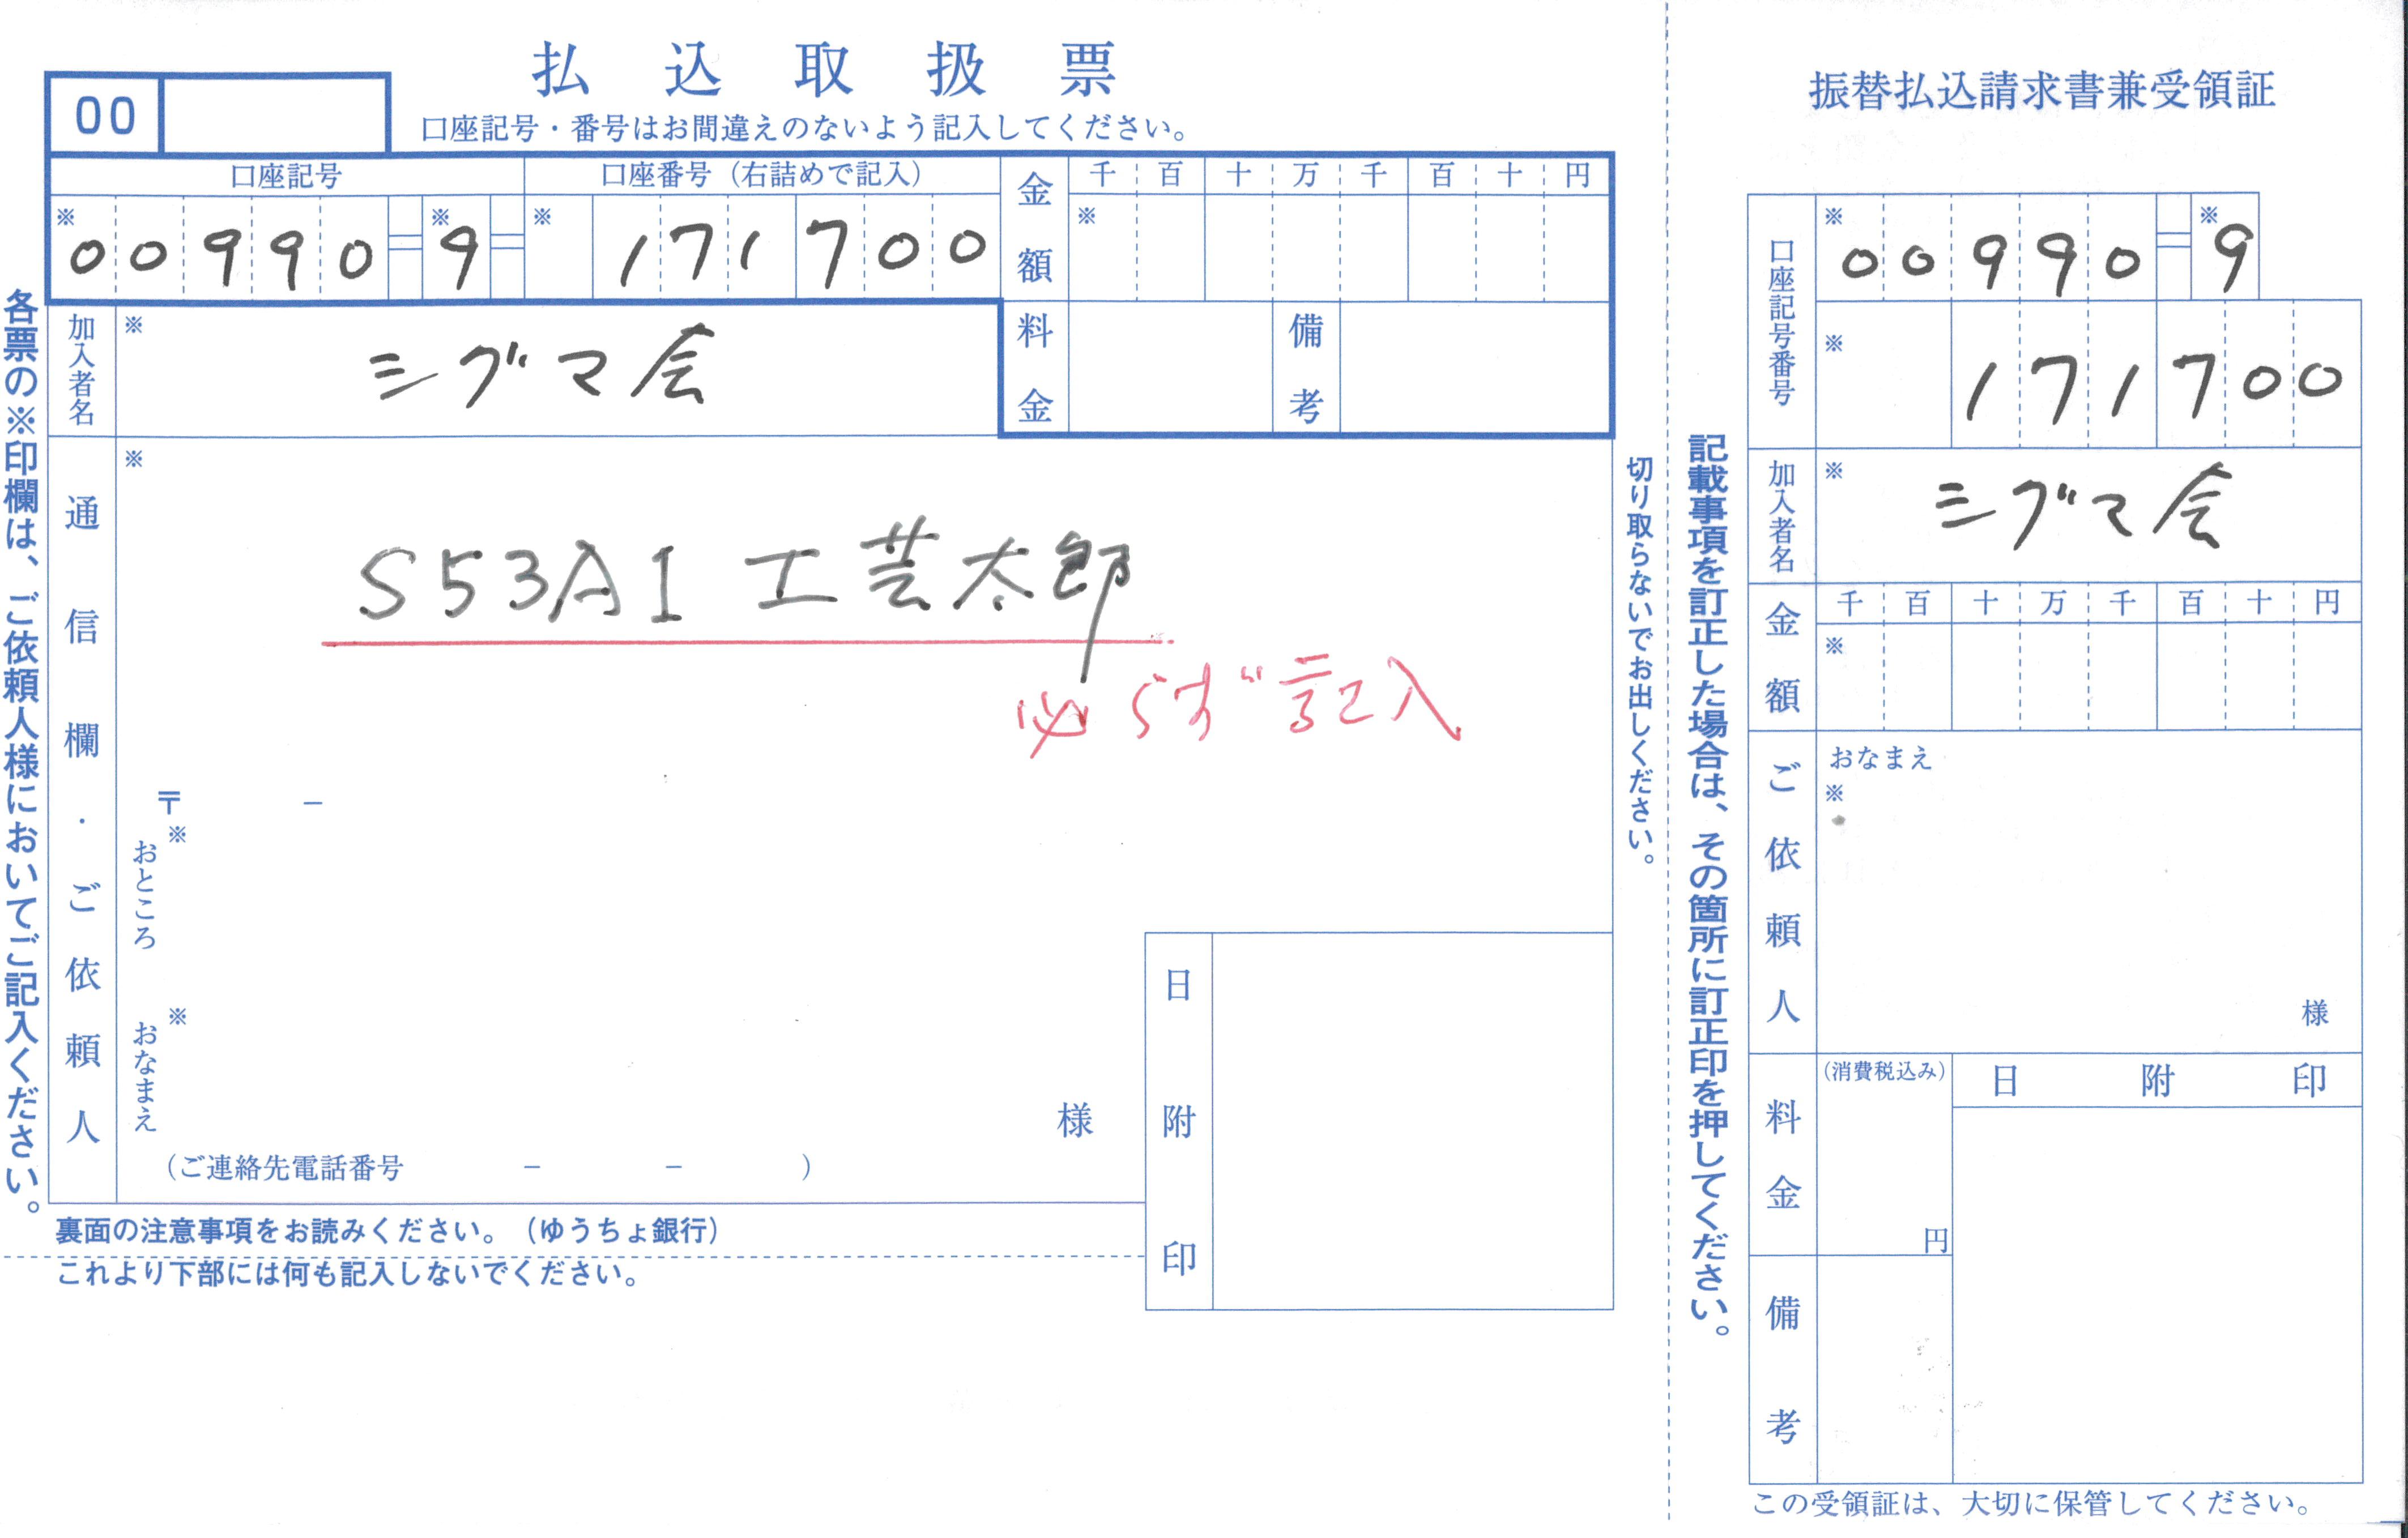 MX-4100FN_20120829_150507_001.jpg